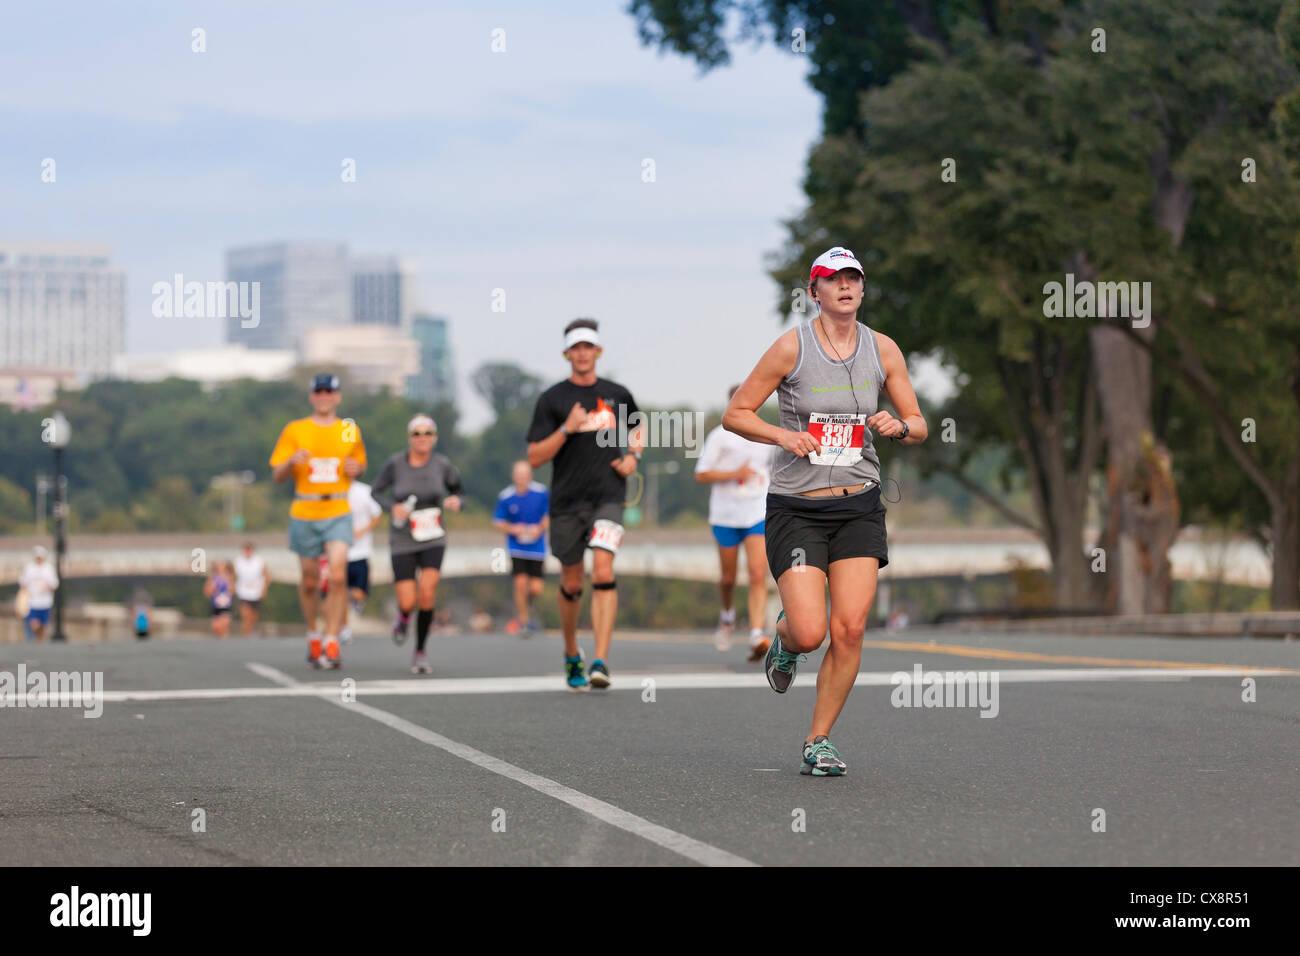 Marathon race runners - Stock Image